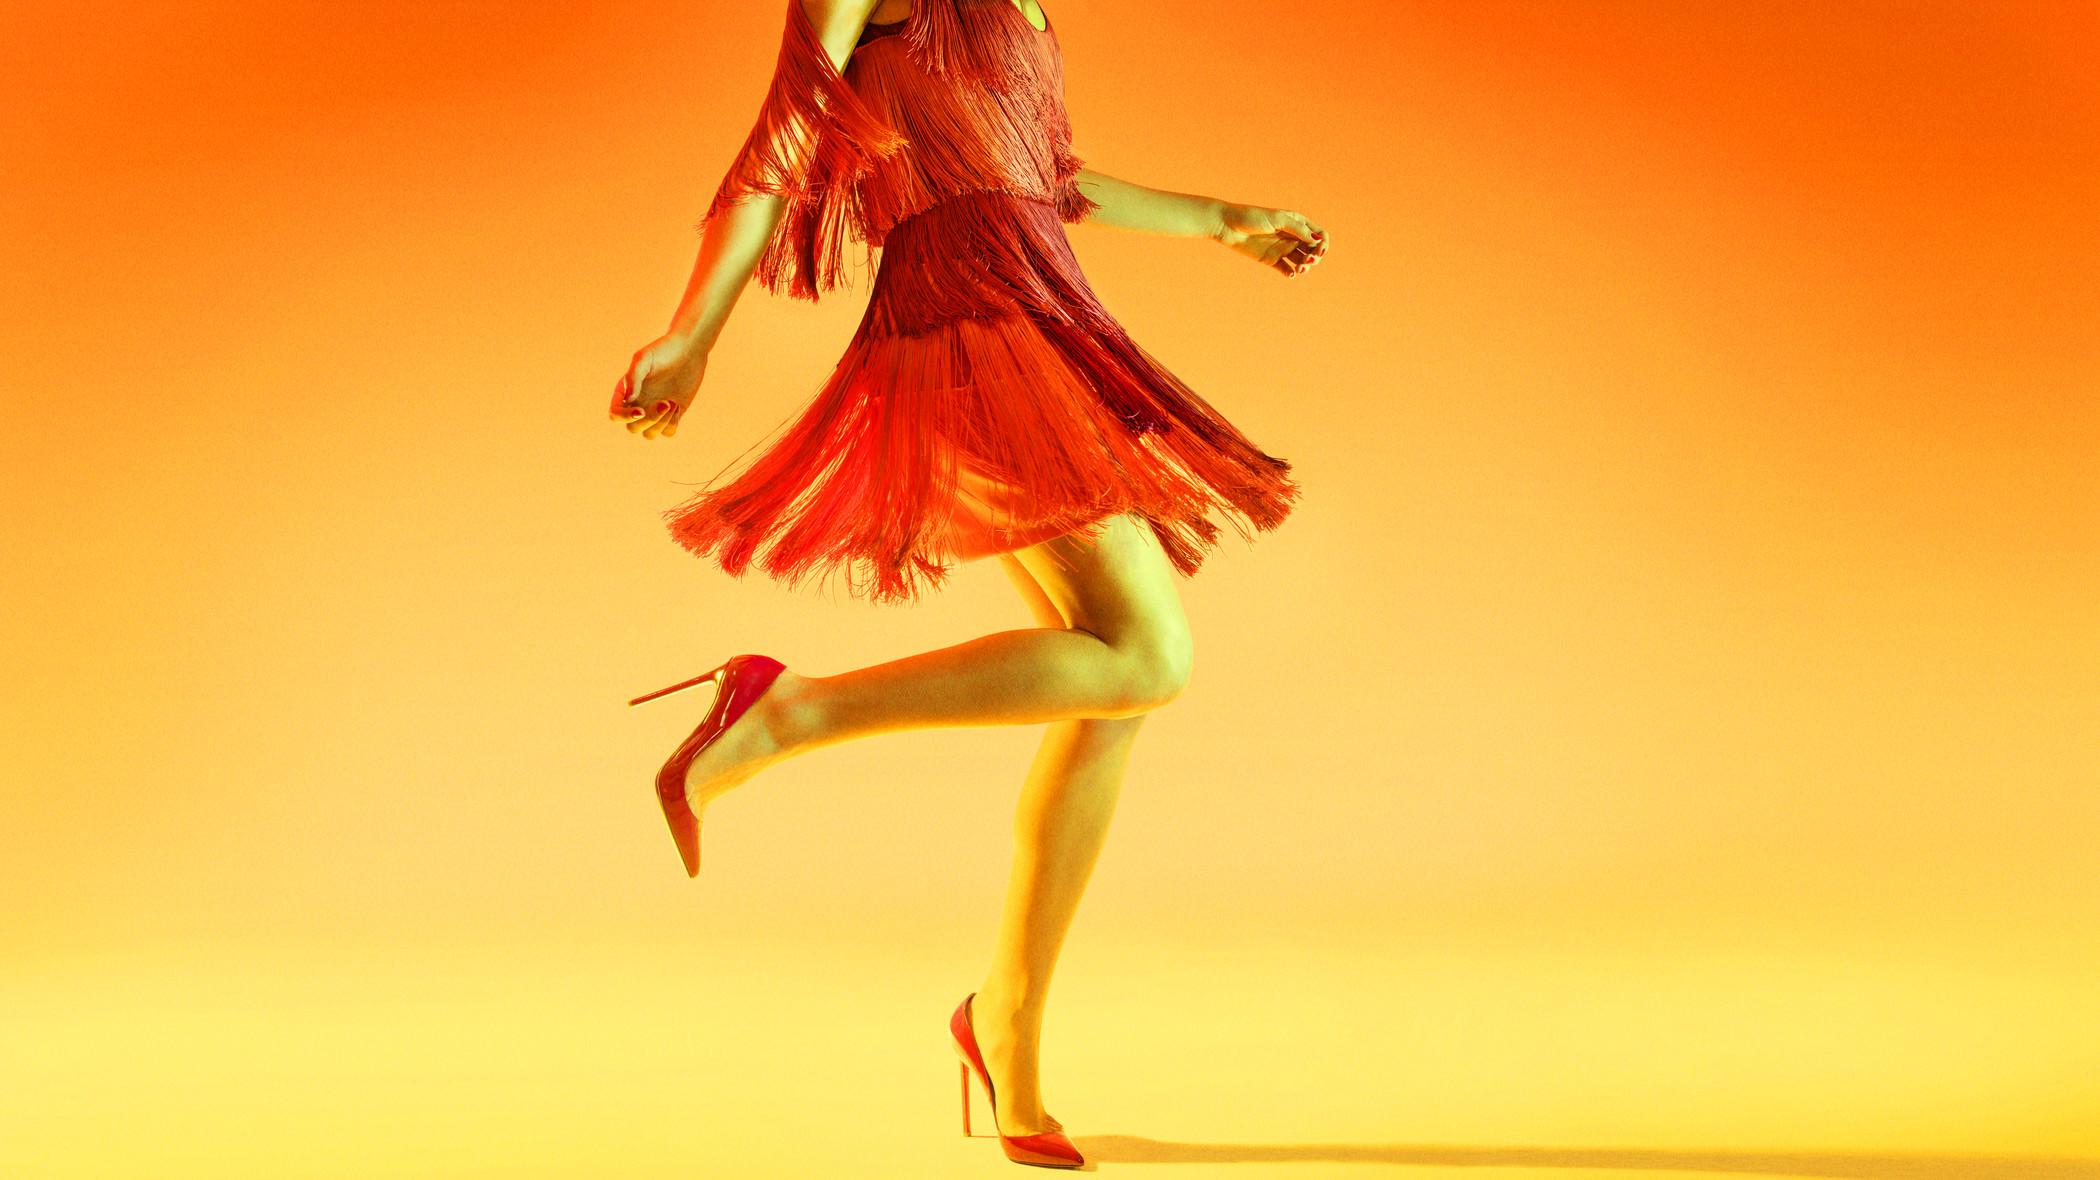 woman wearing orange dress